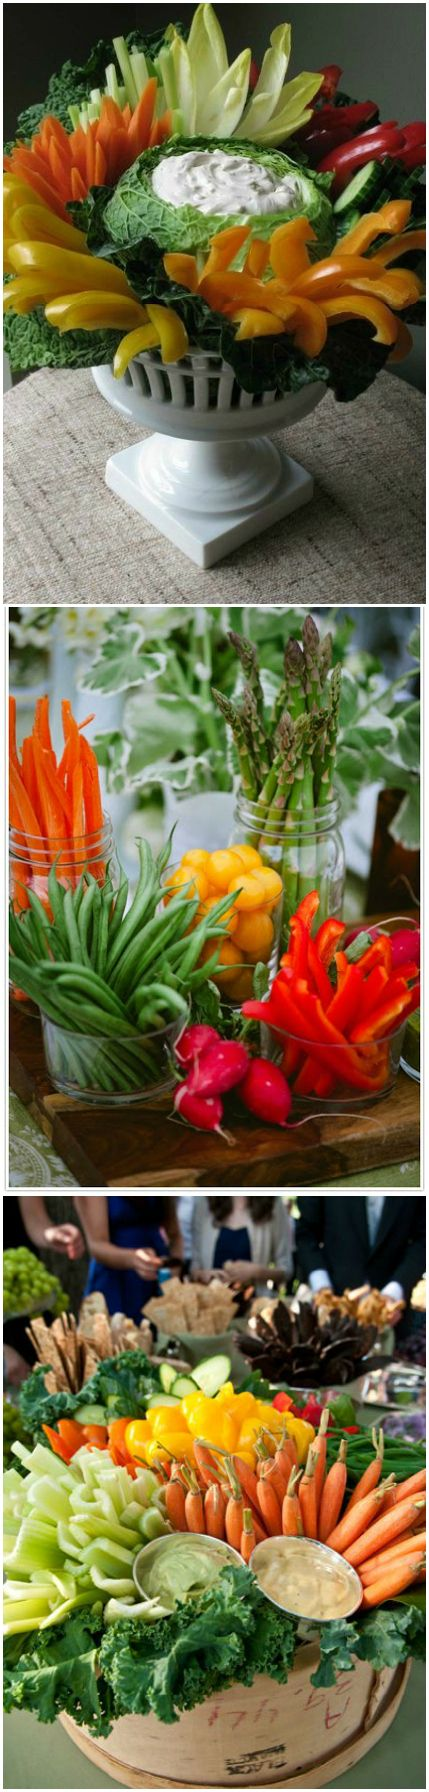 Party ● Vegetable Serving Displays